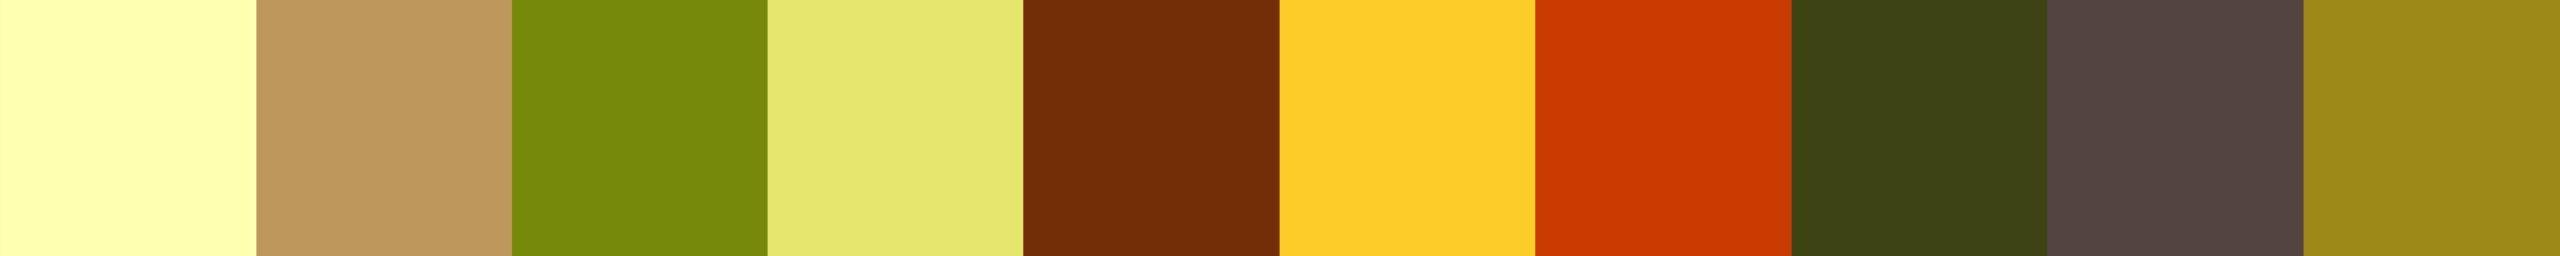 721 Nosterala Color Palette